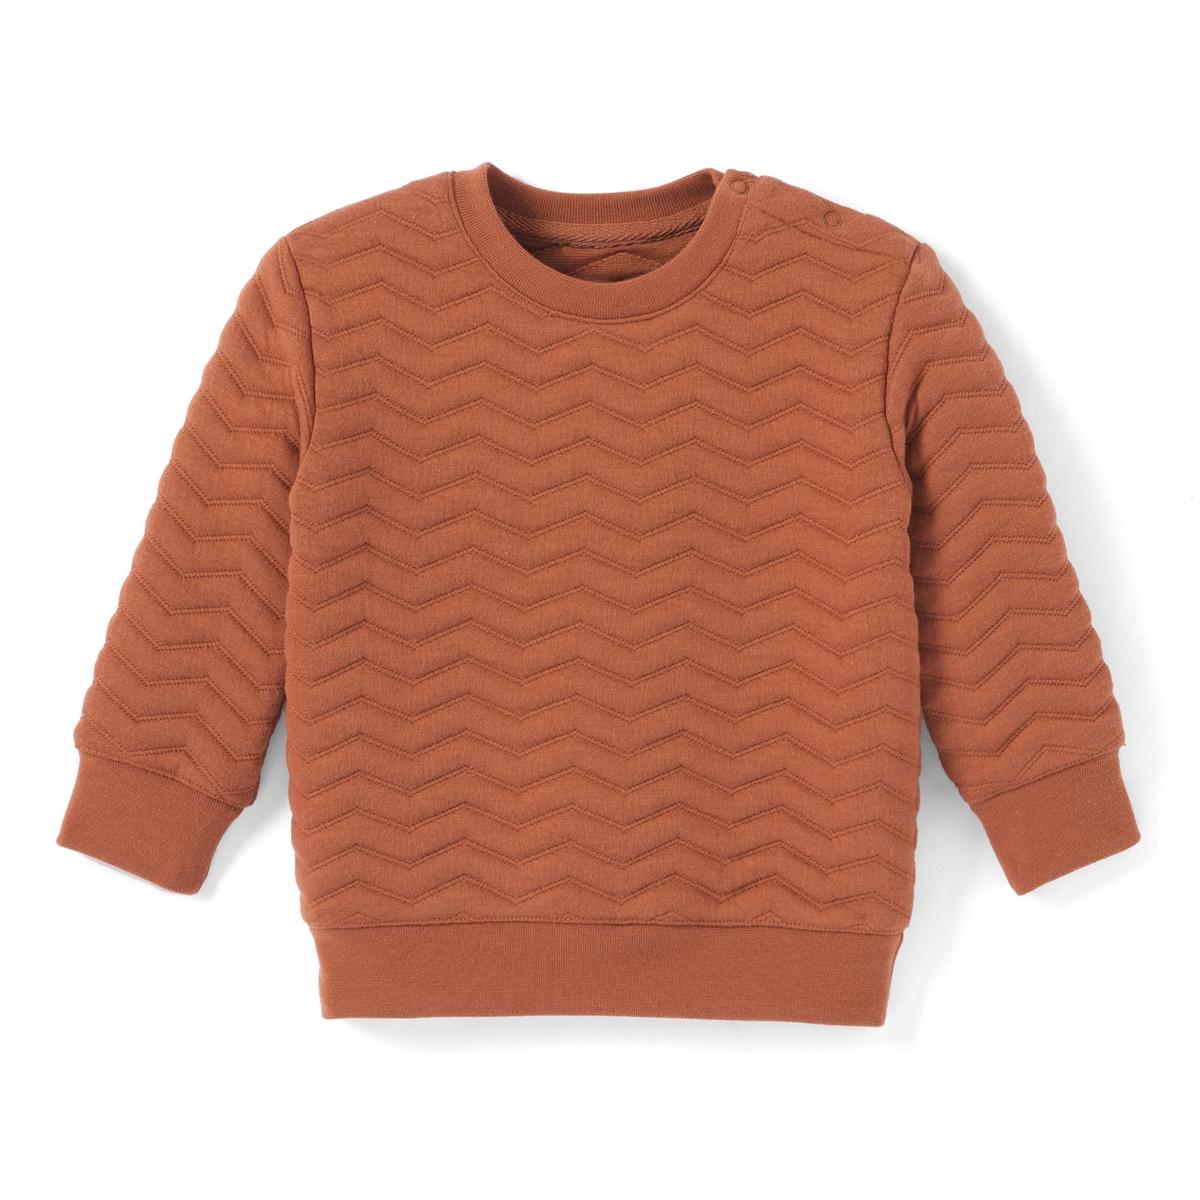 Sweatshirt, gesteppt, 1 Monat 3 Jahre